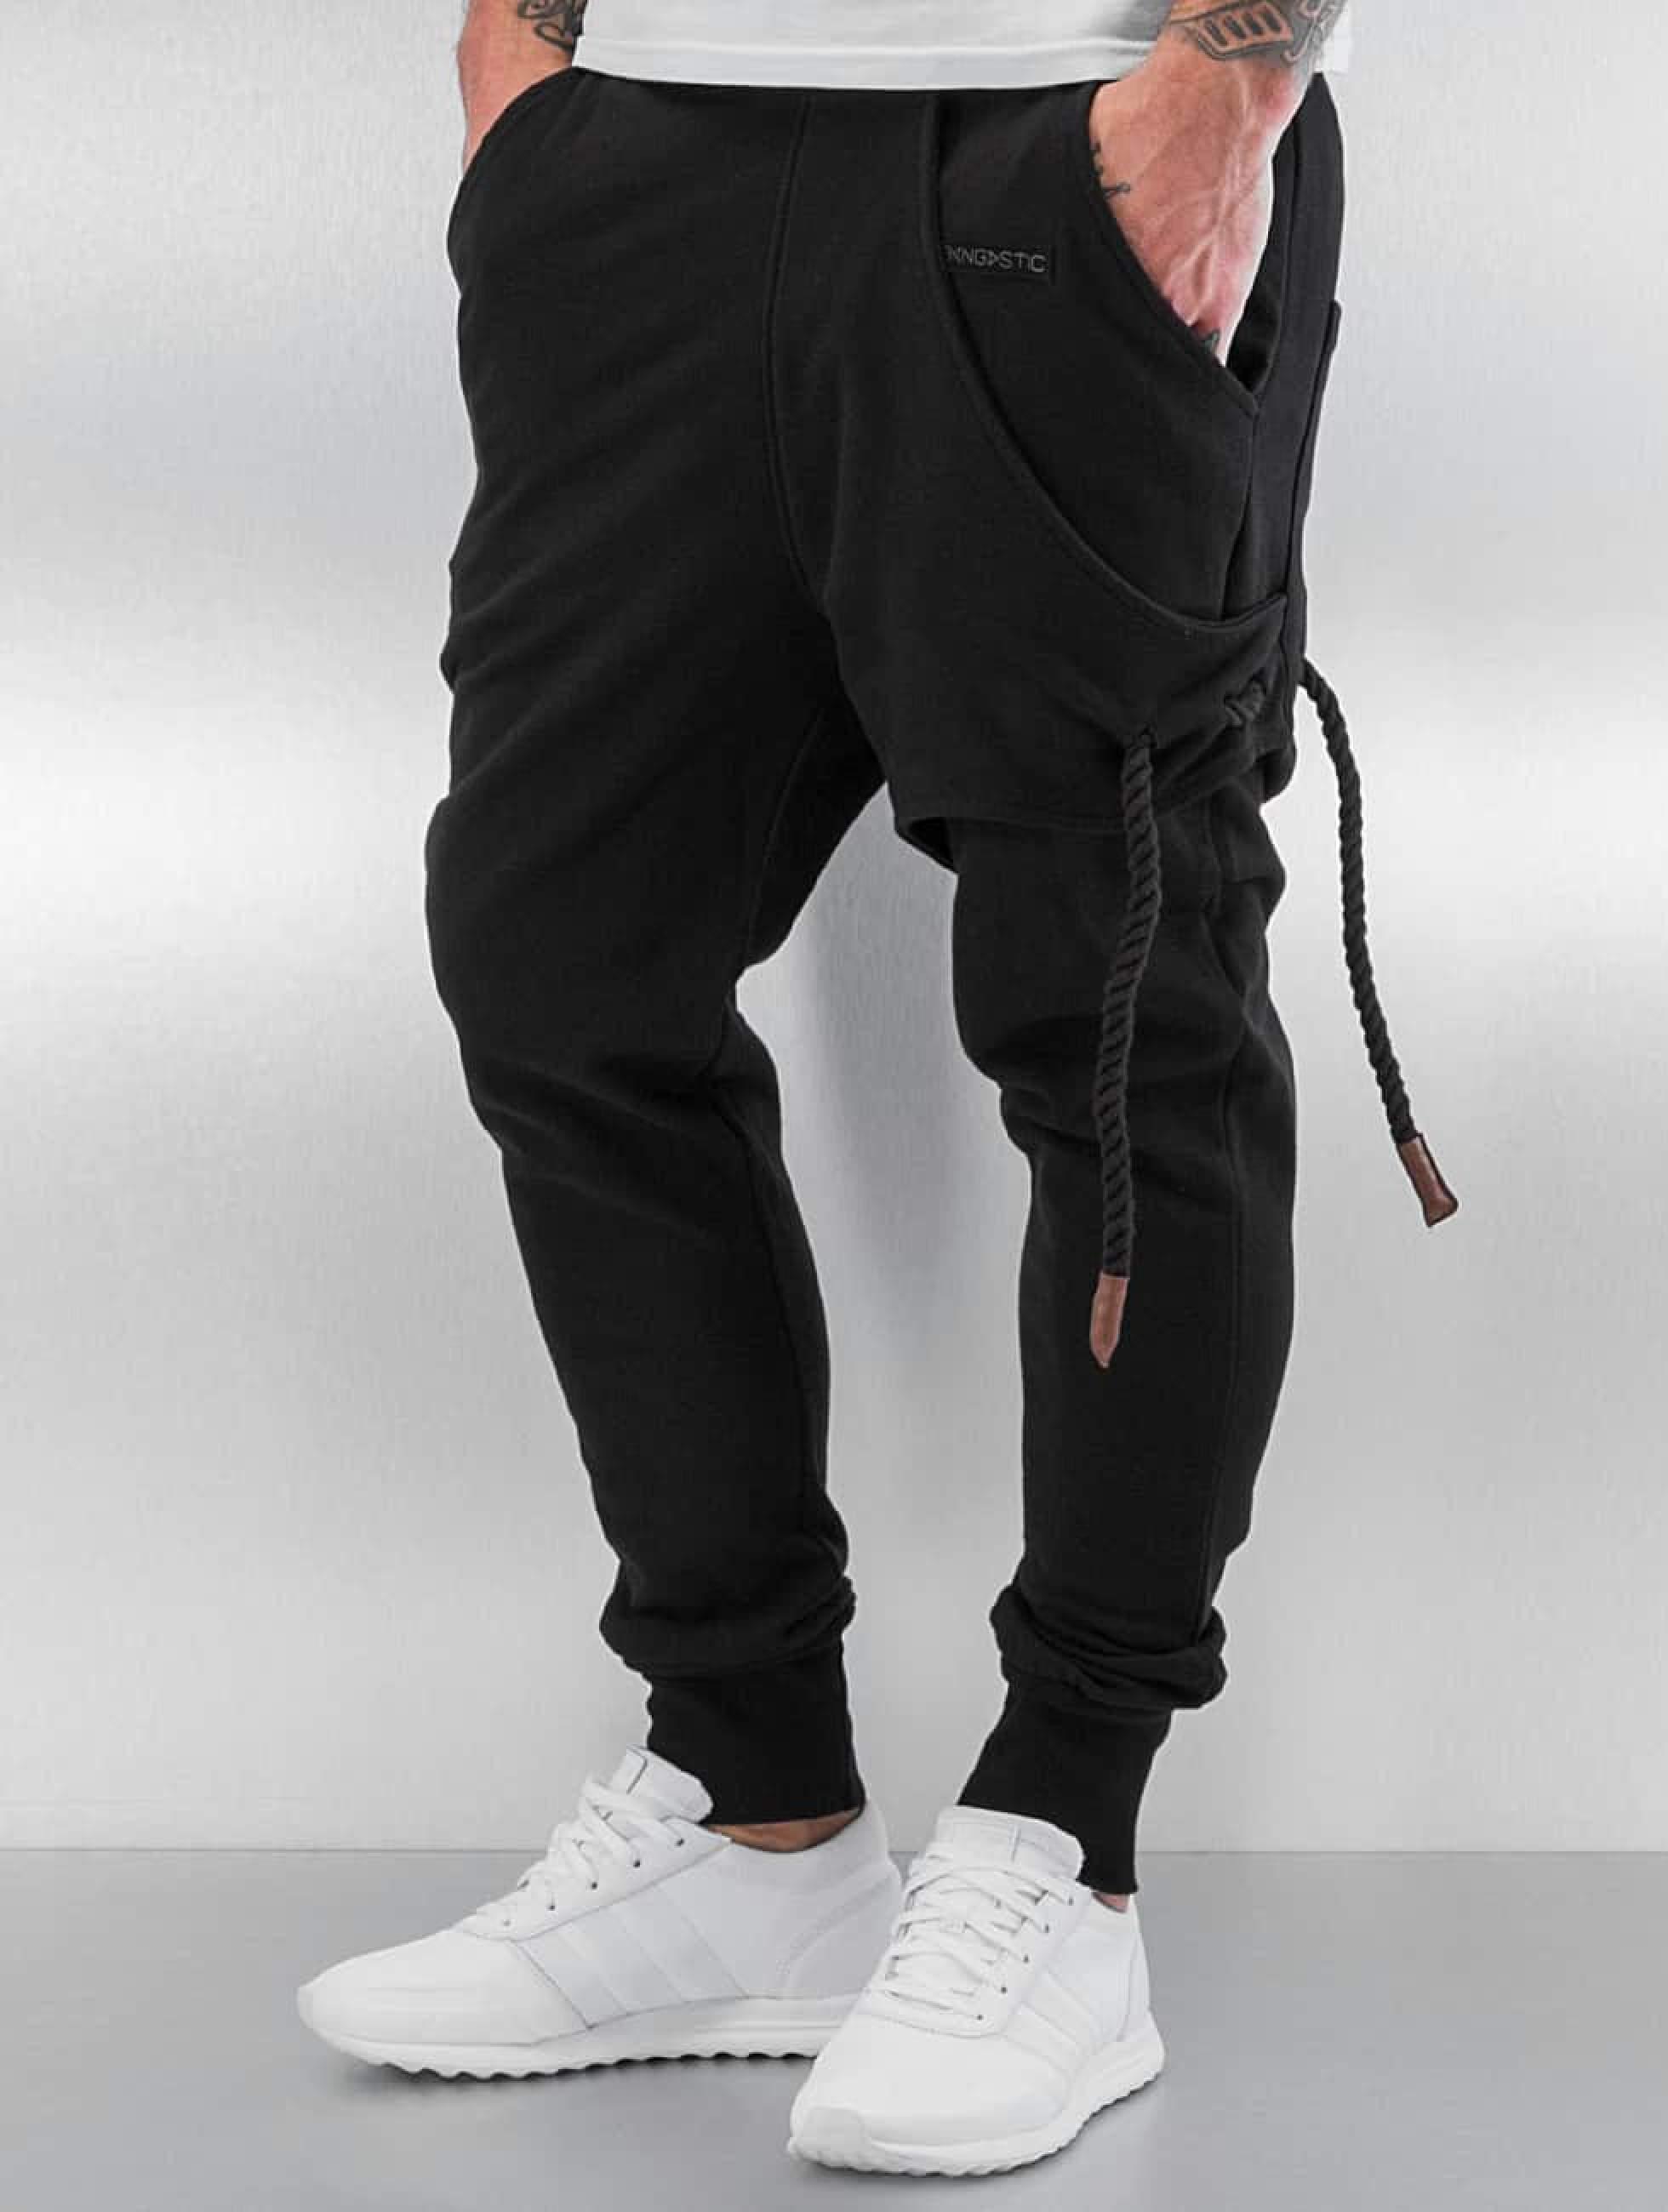 Bangastic / Sweat Pant London in black XL